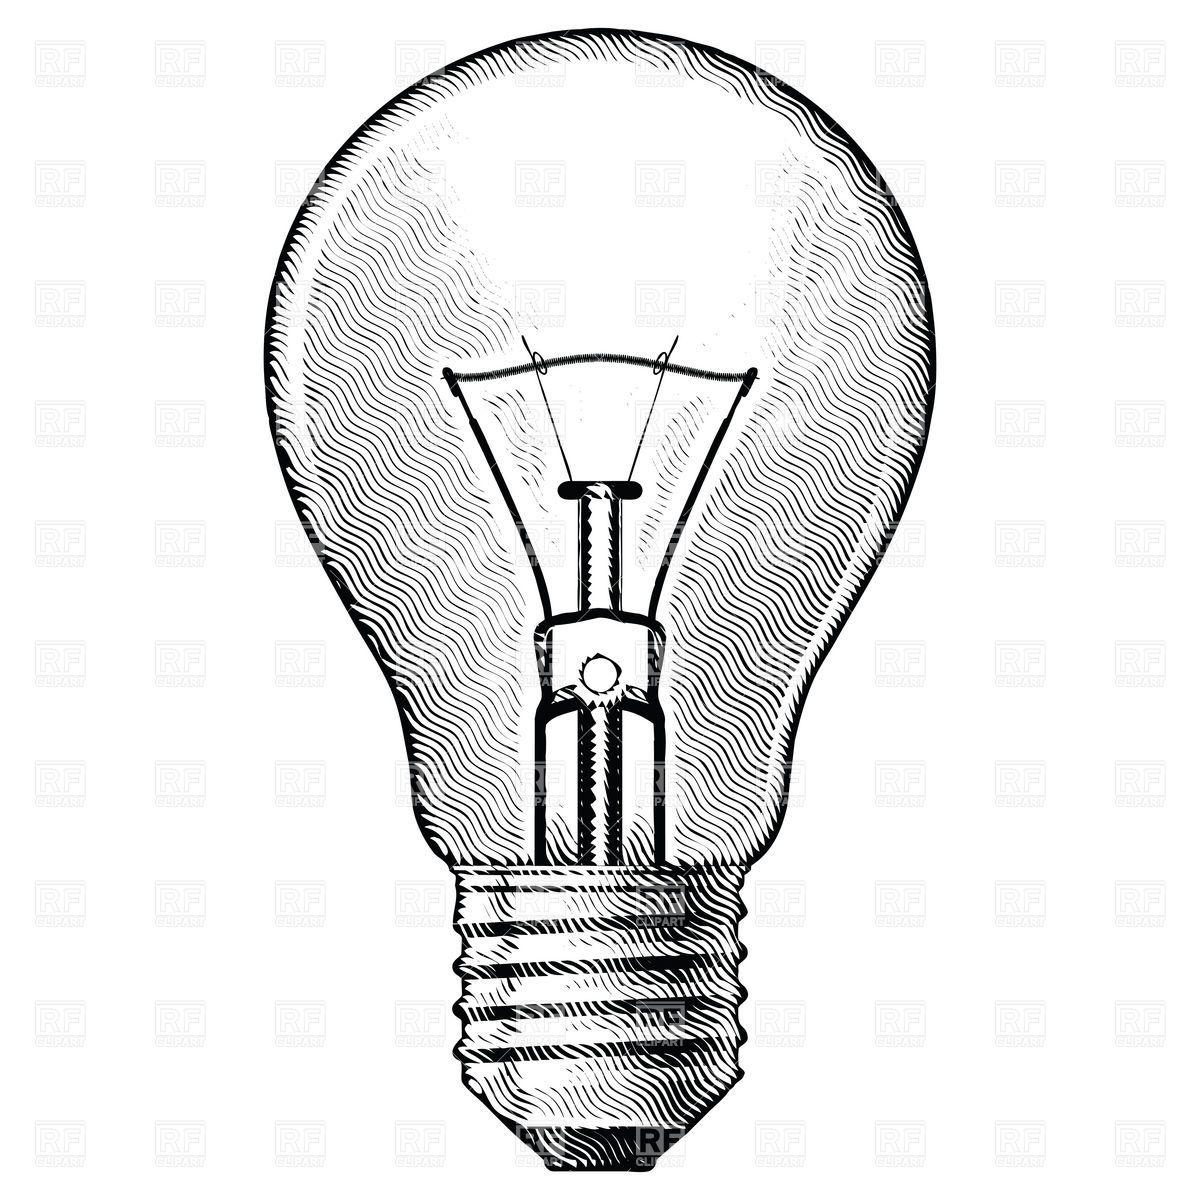 Lightbulb clipart old lightbulb. Sketch google search tattoo